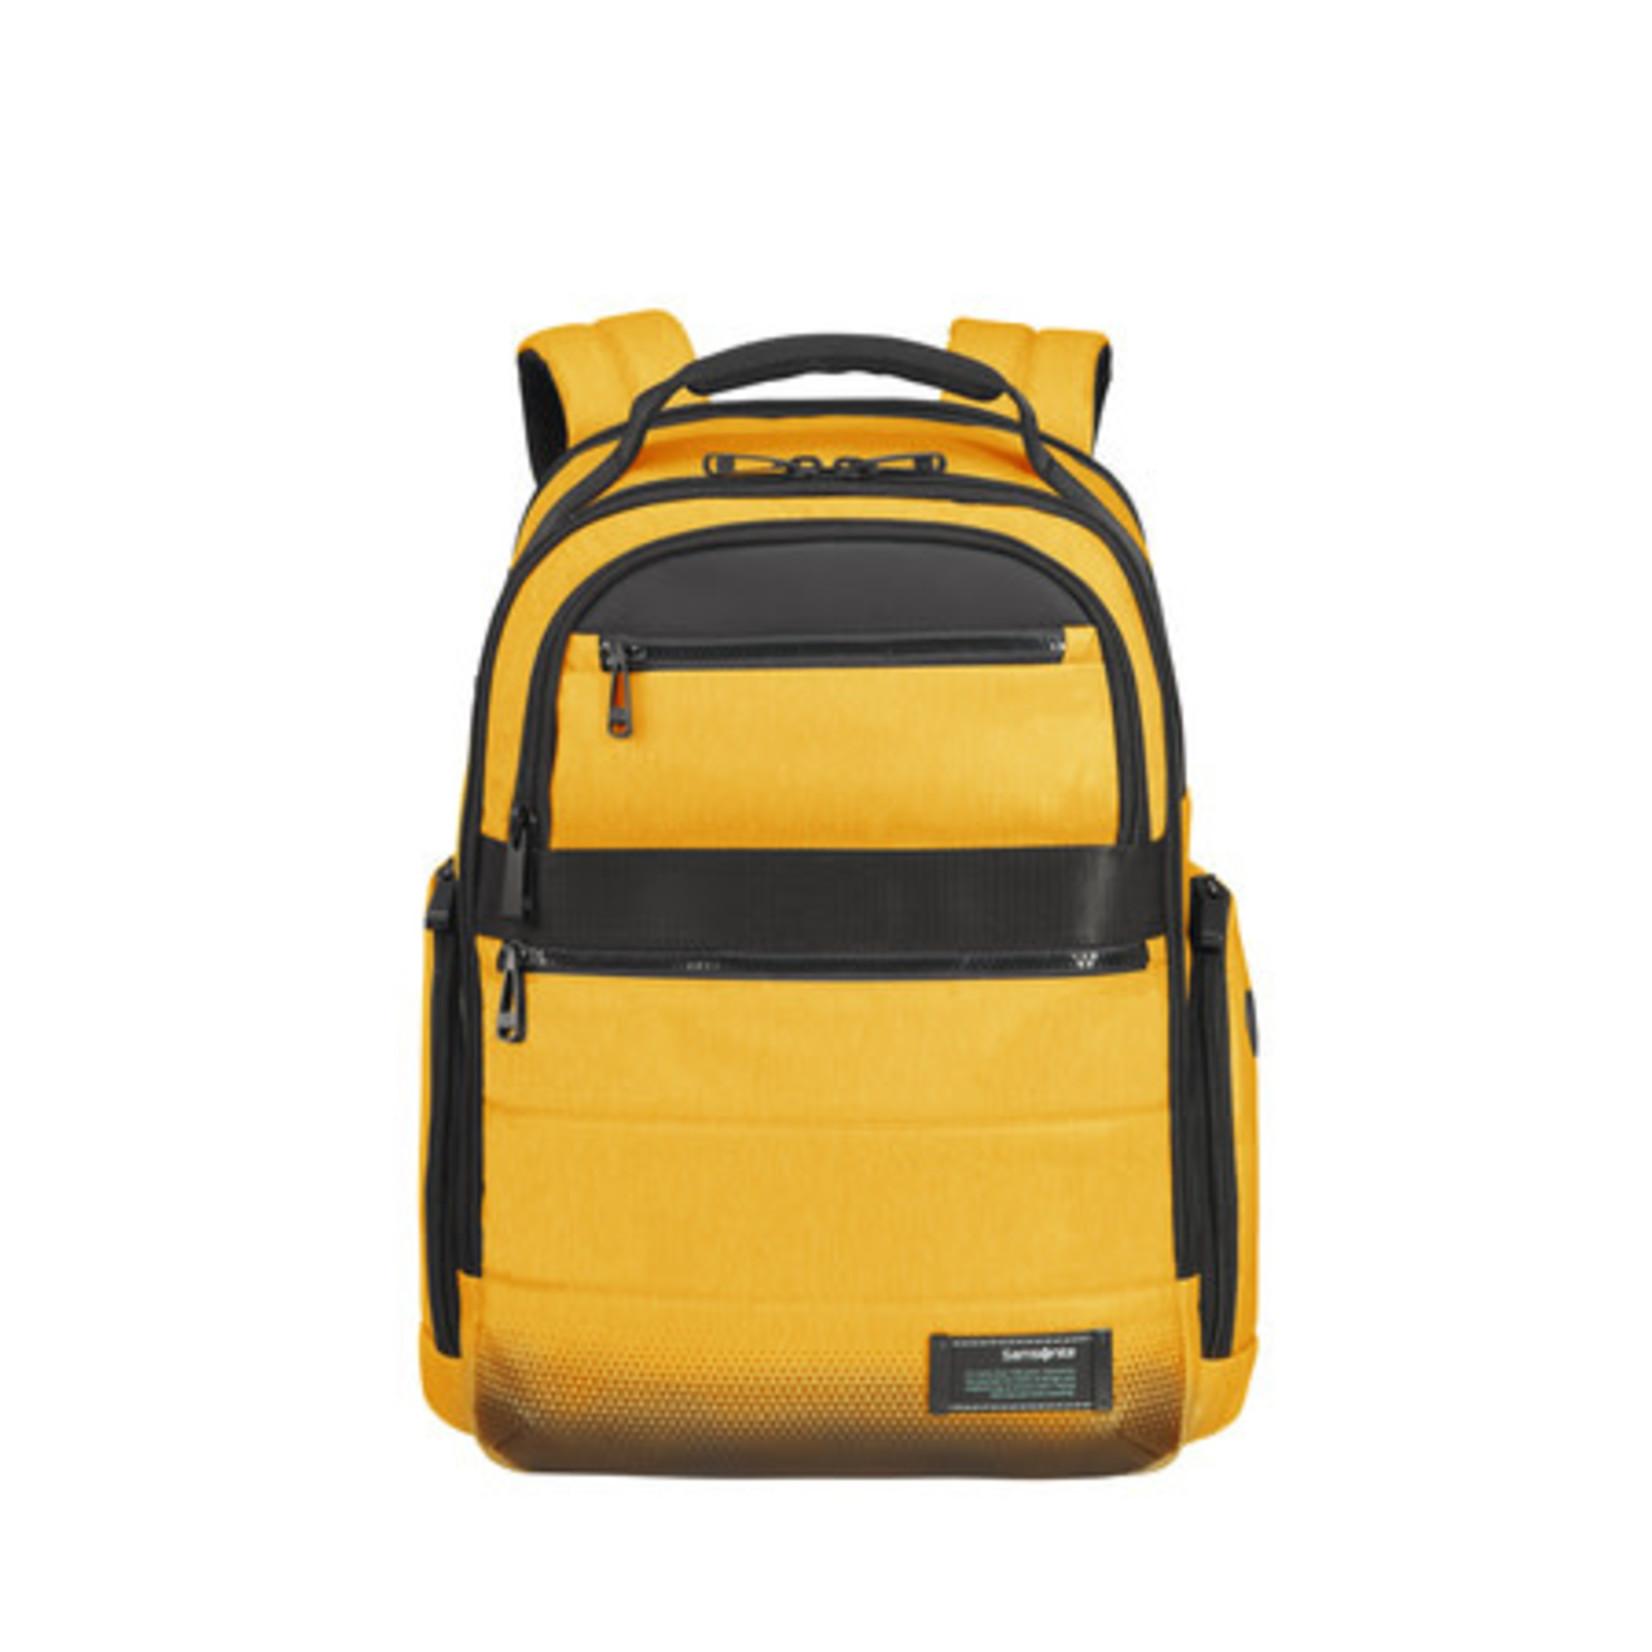 Samsonite Laptoprugtas Cityvibe 2.0 Golden Yellow 14,1''